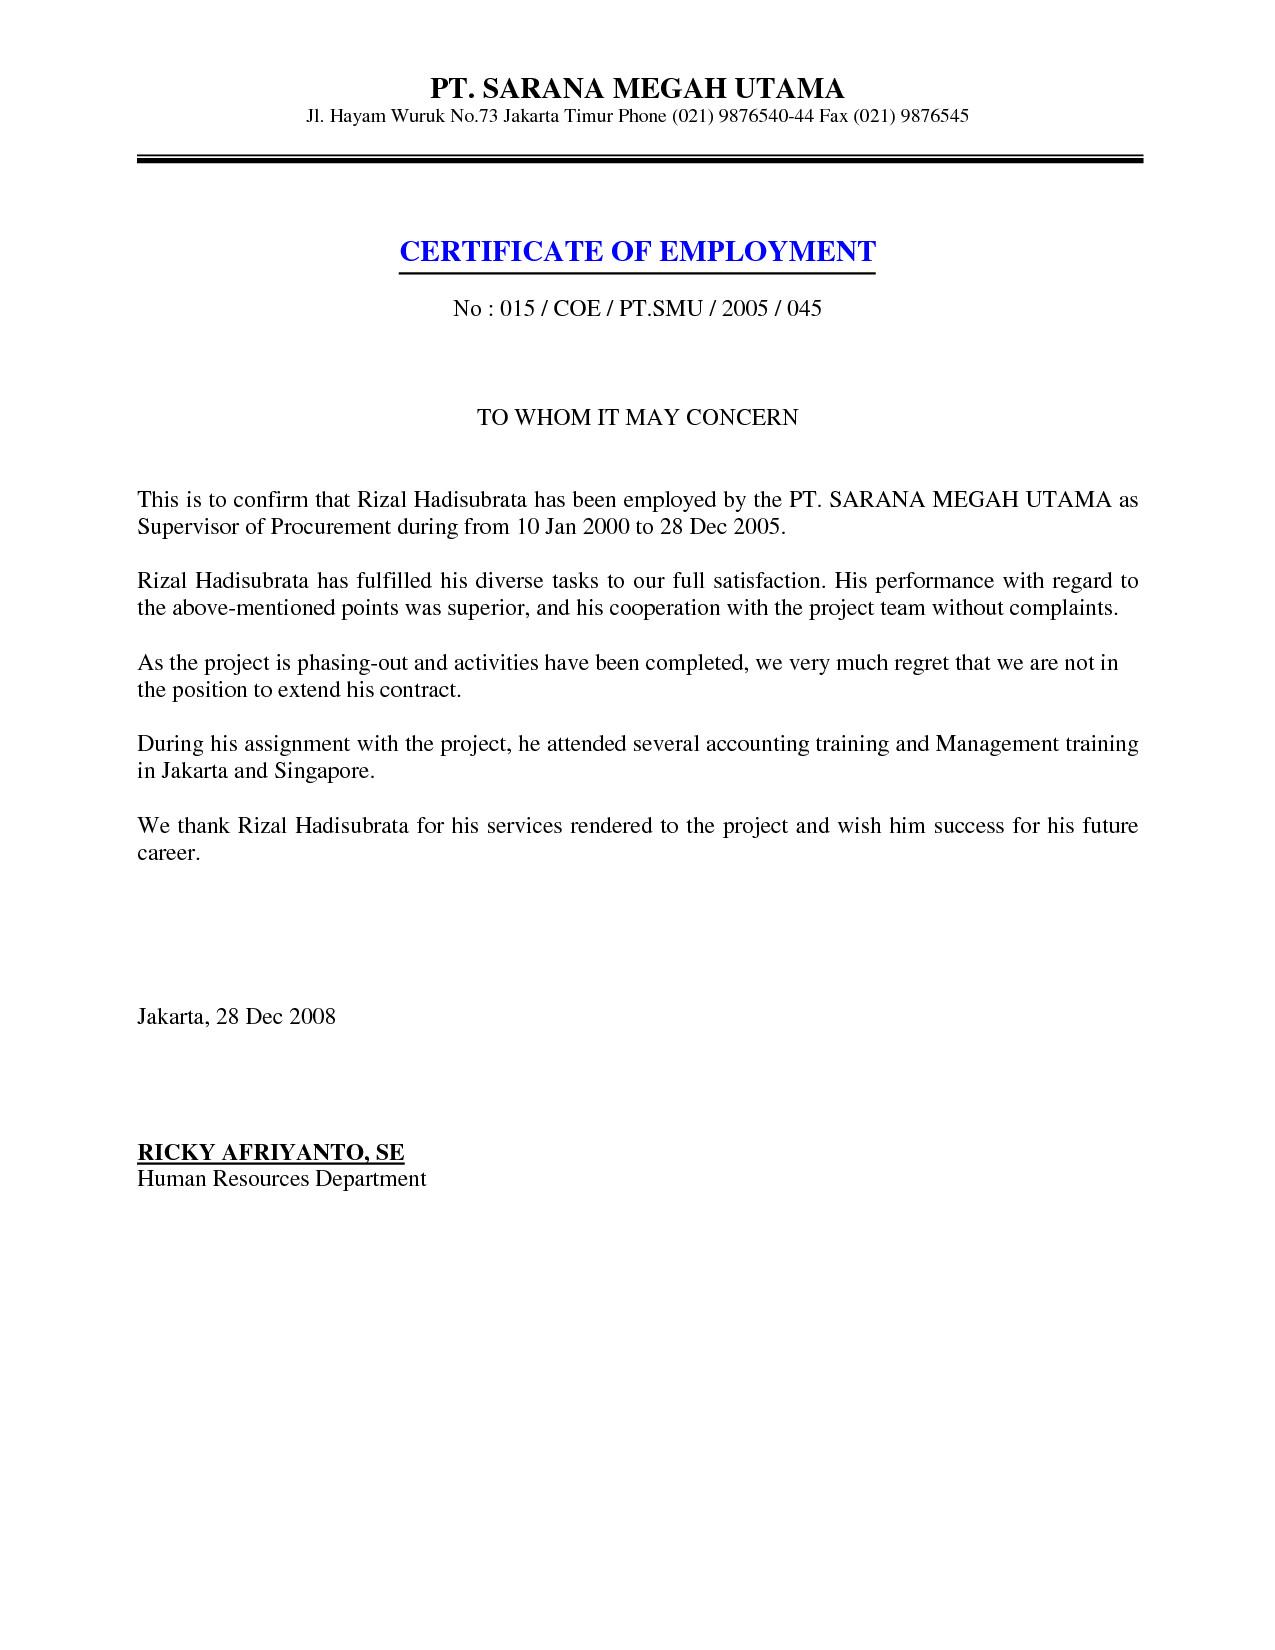 Certificate Of Employment Template Job Employment Certificate Sample Certification Letter